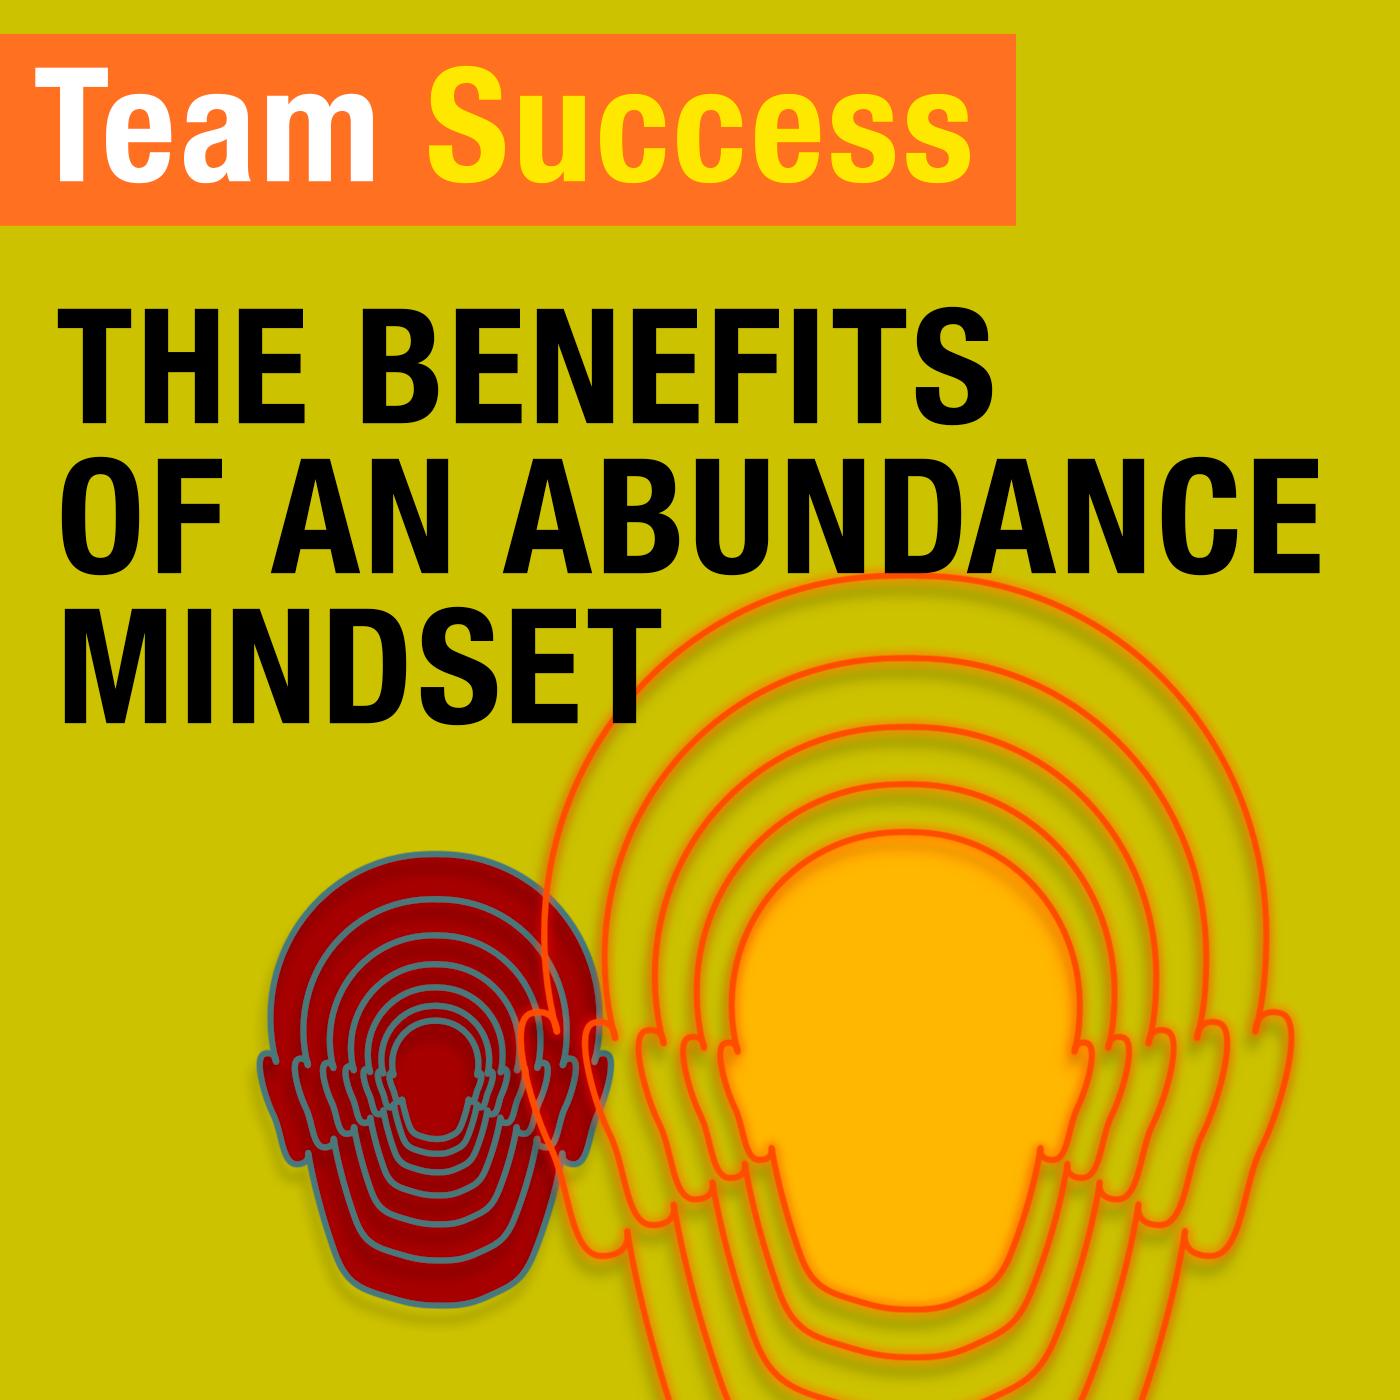 Benefits Of An Abundant Mindset - Team Success Podcast